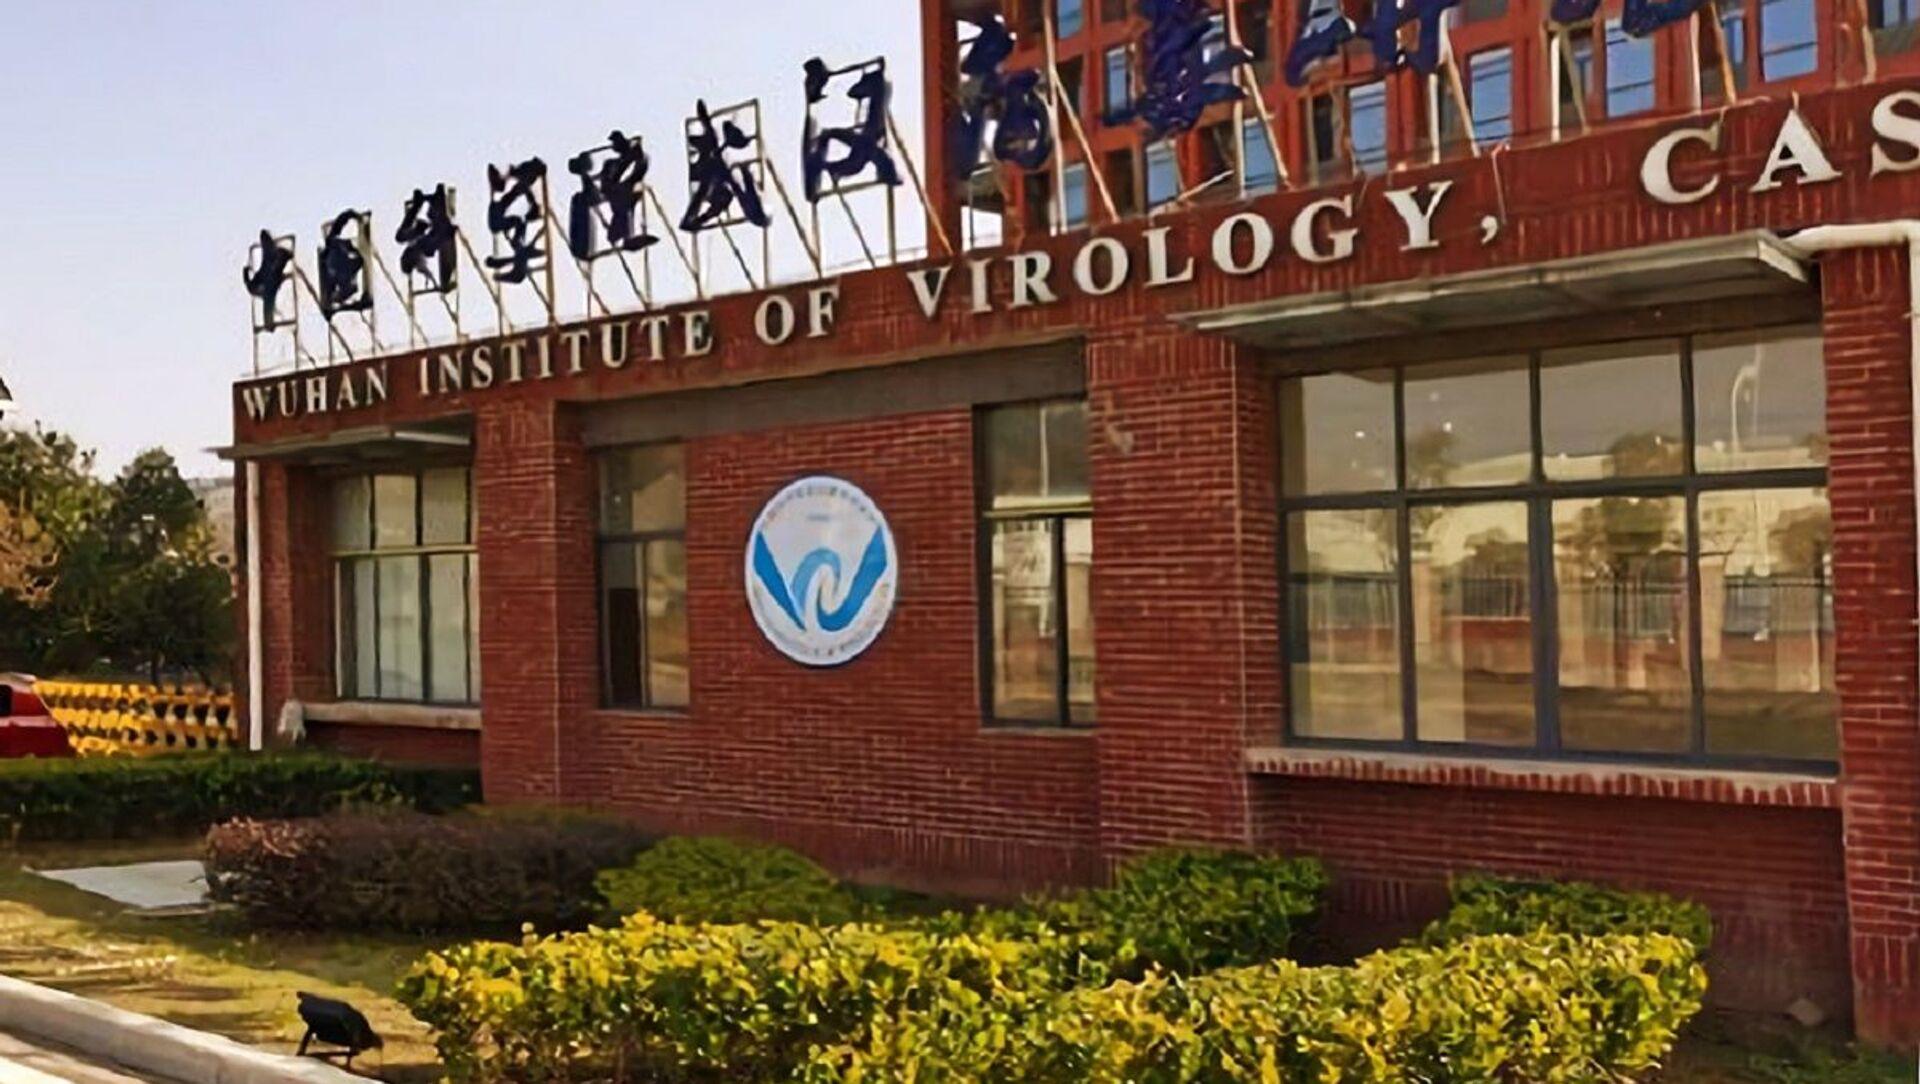 Wuhan Institute of Virology  - Sputnik International, 1920, 02.08.2021